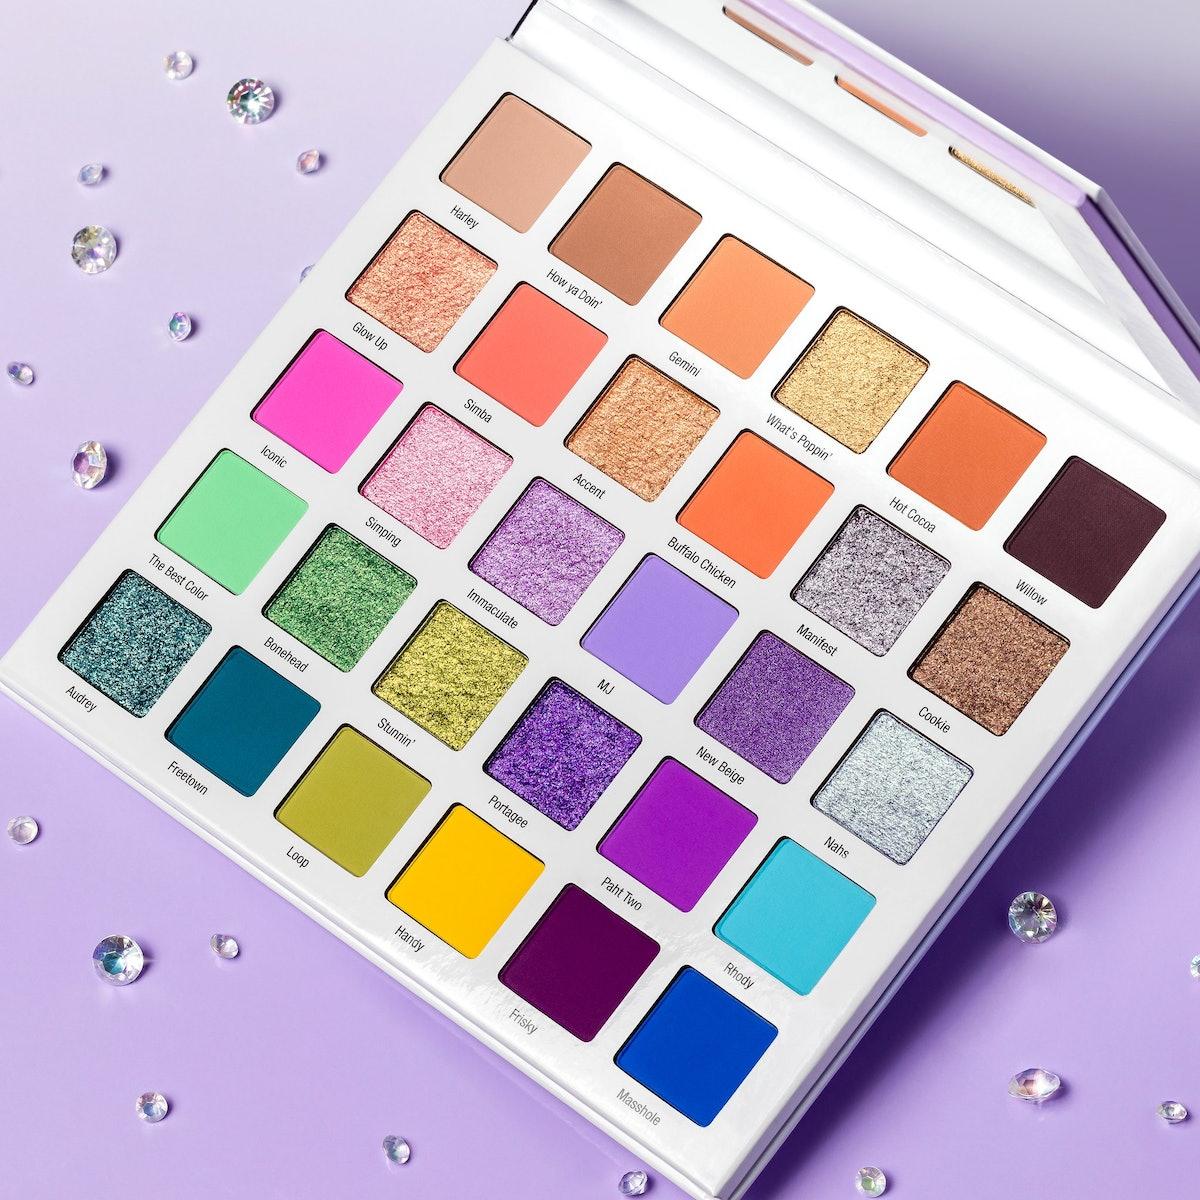 Mikayla x Glamlite Palette